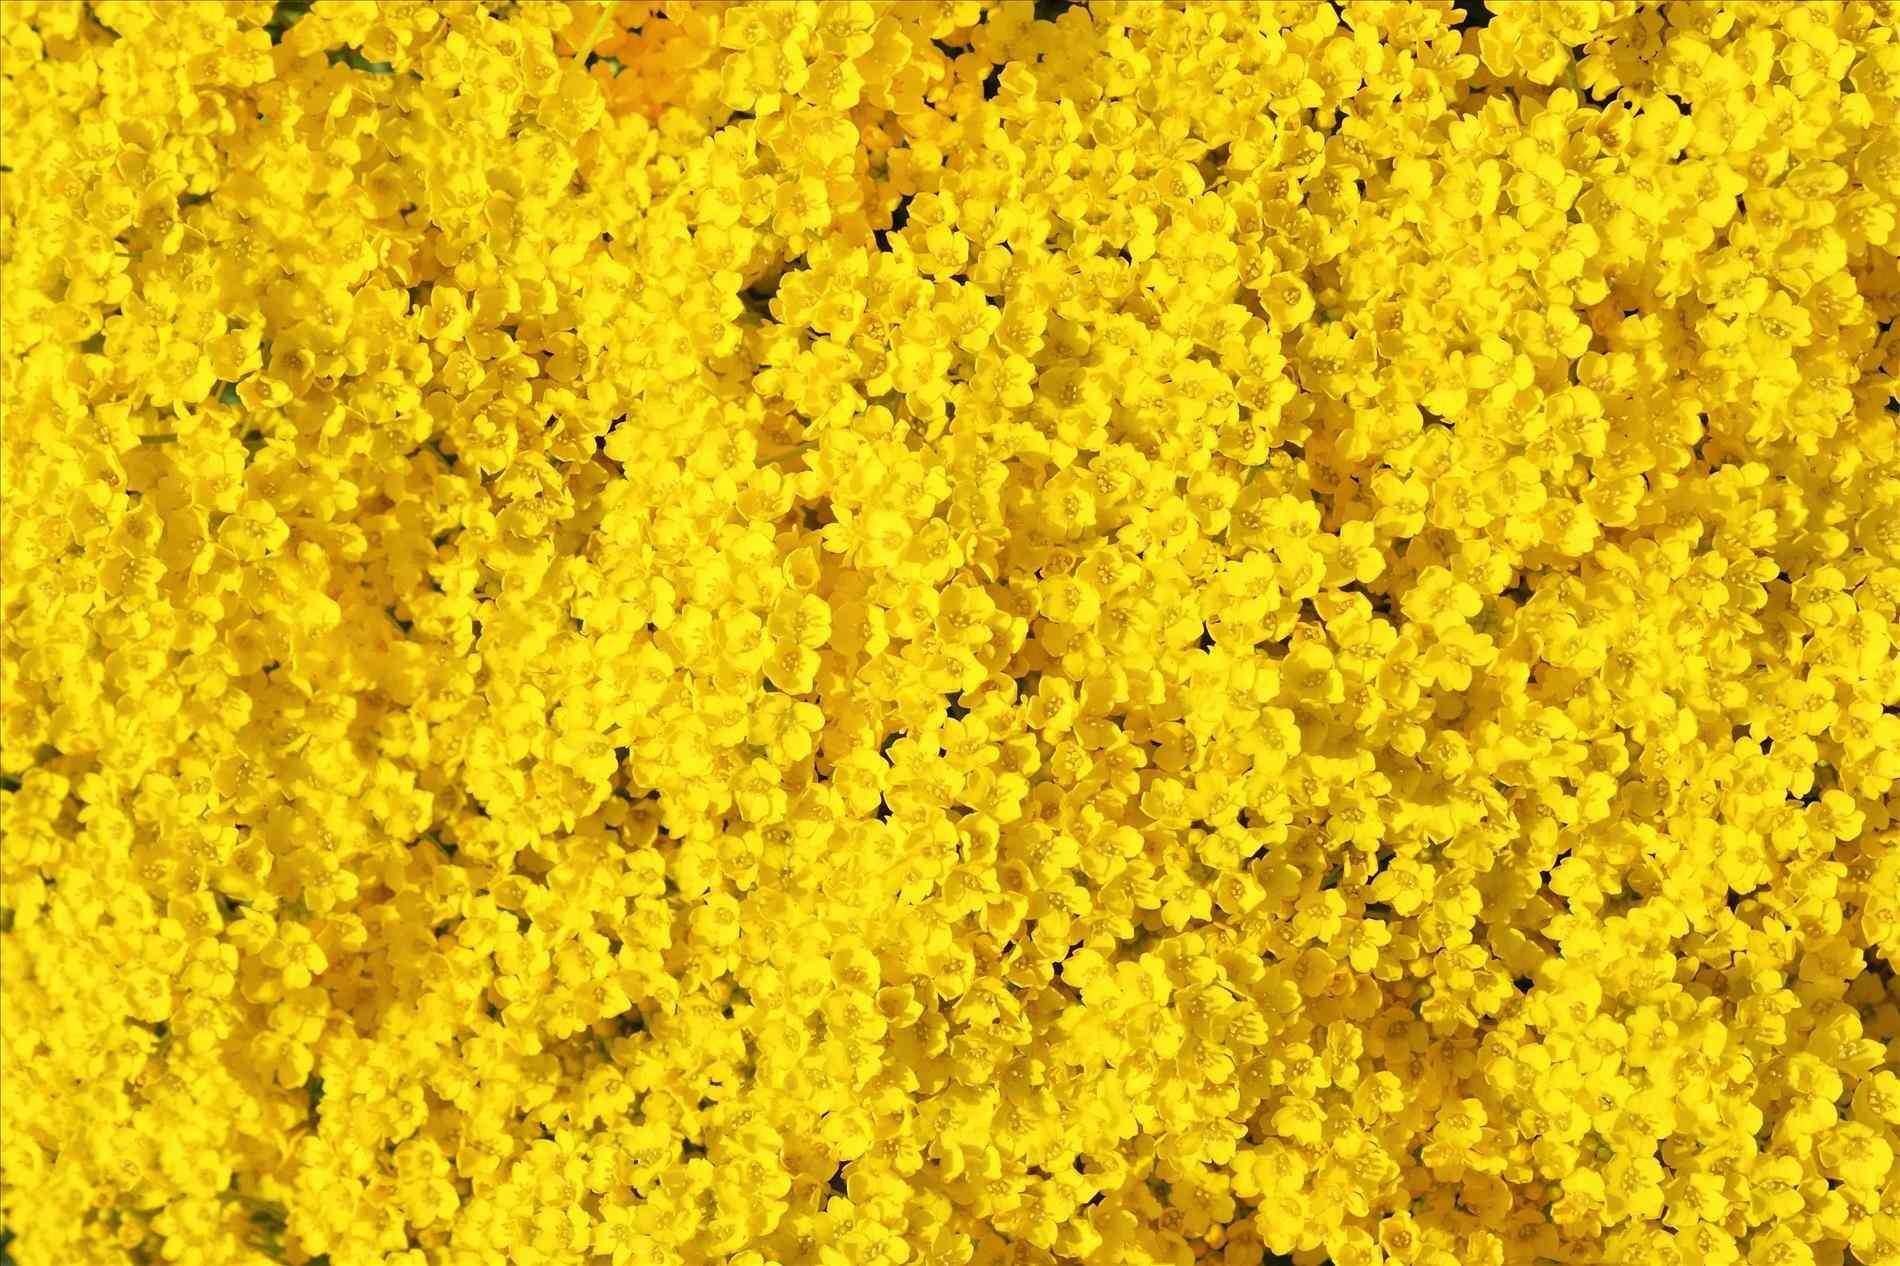 yellow aesthetic computer wallpaper